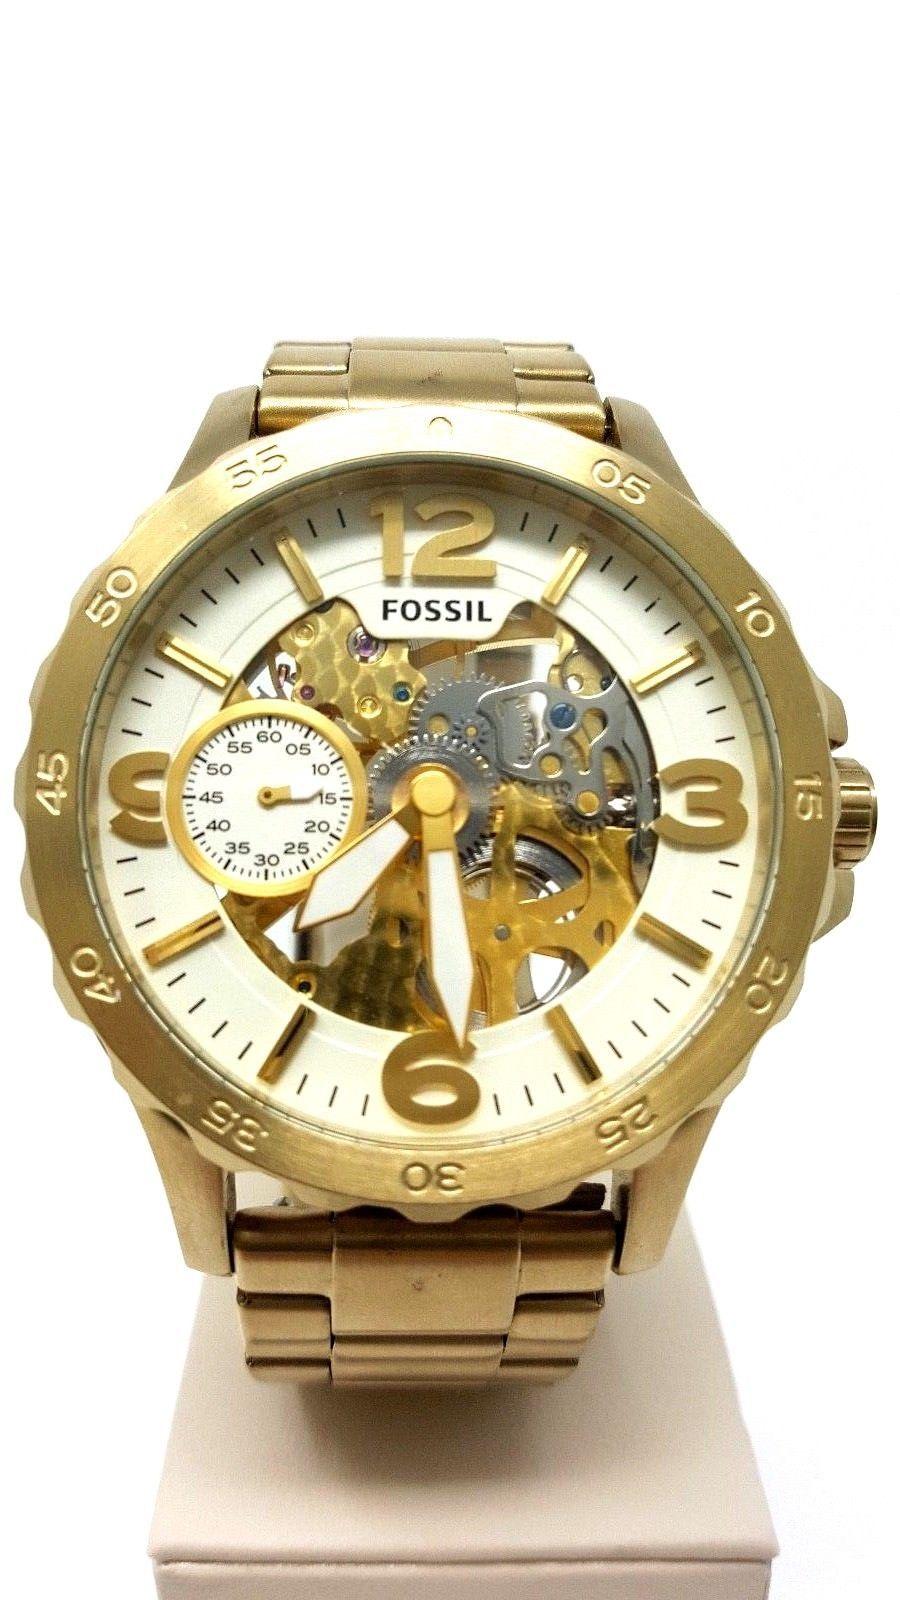 Daftar Harga Fossil Es3947 Update 2018 Loop Ekskul Steam Wallet 15 Nate Mechanical Oversized 50mm Gold Skeleton Stainless Steel Watch Me3150 Watches For Men